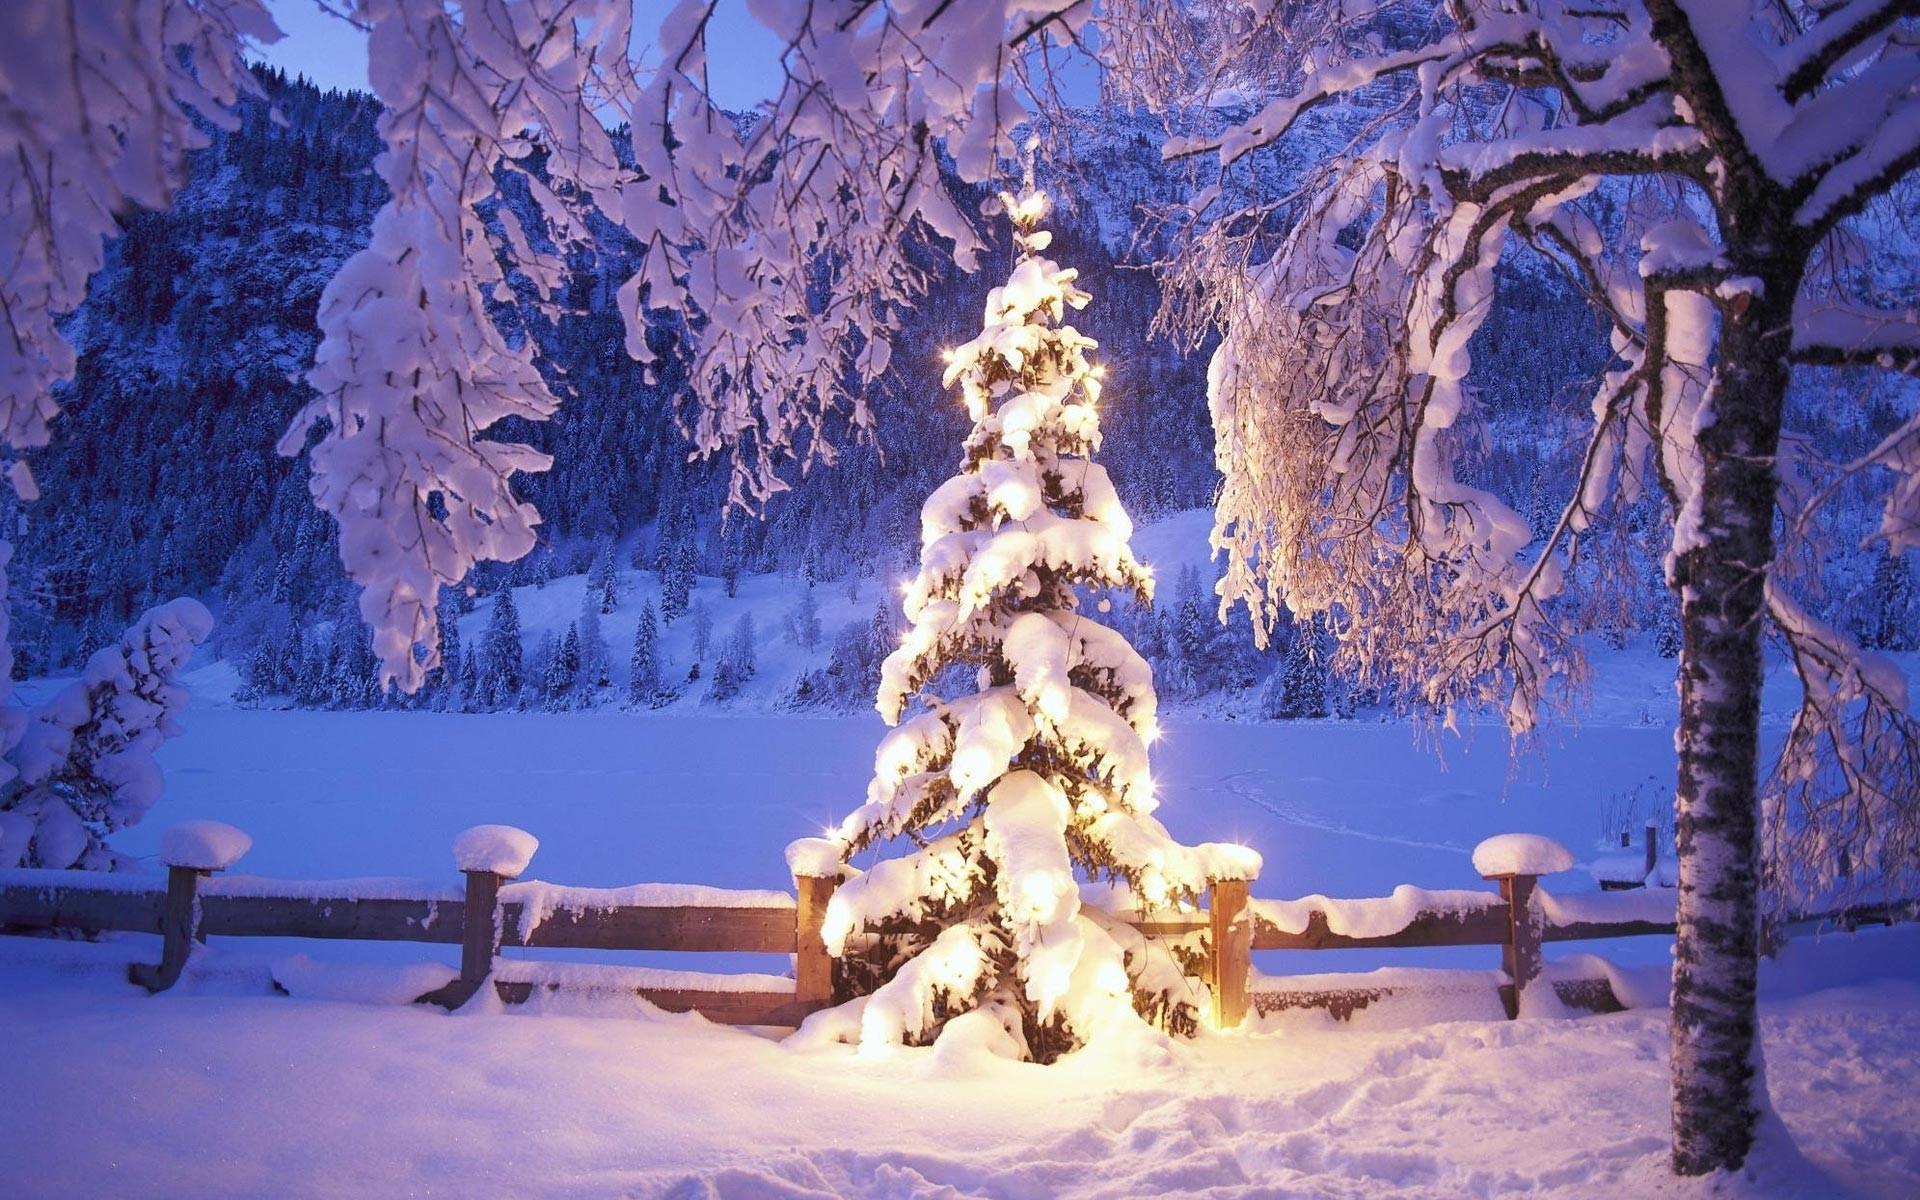 2016 Christmas Tree Wallpaper Hd